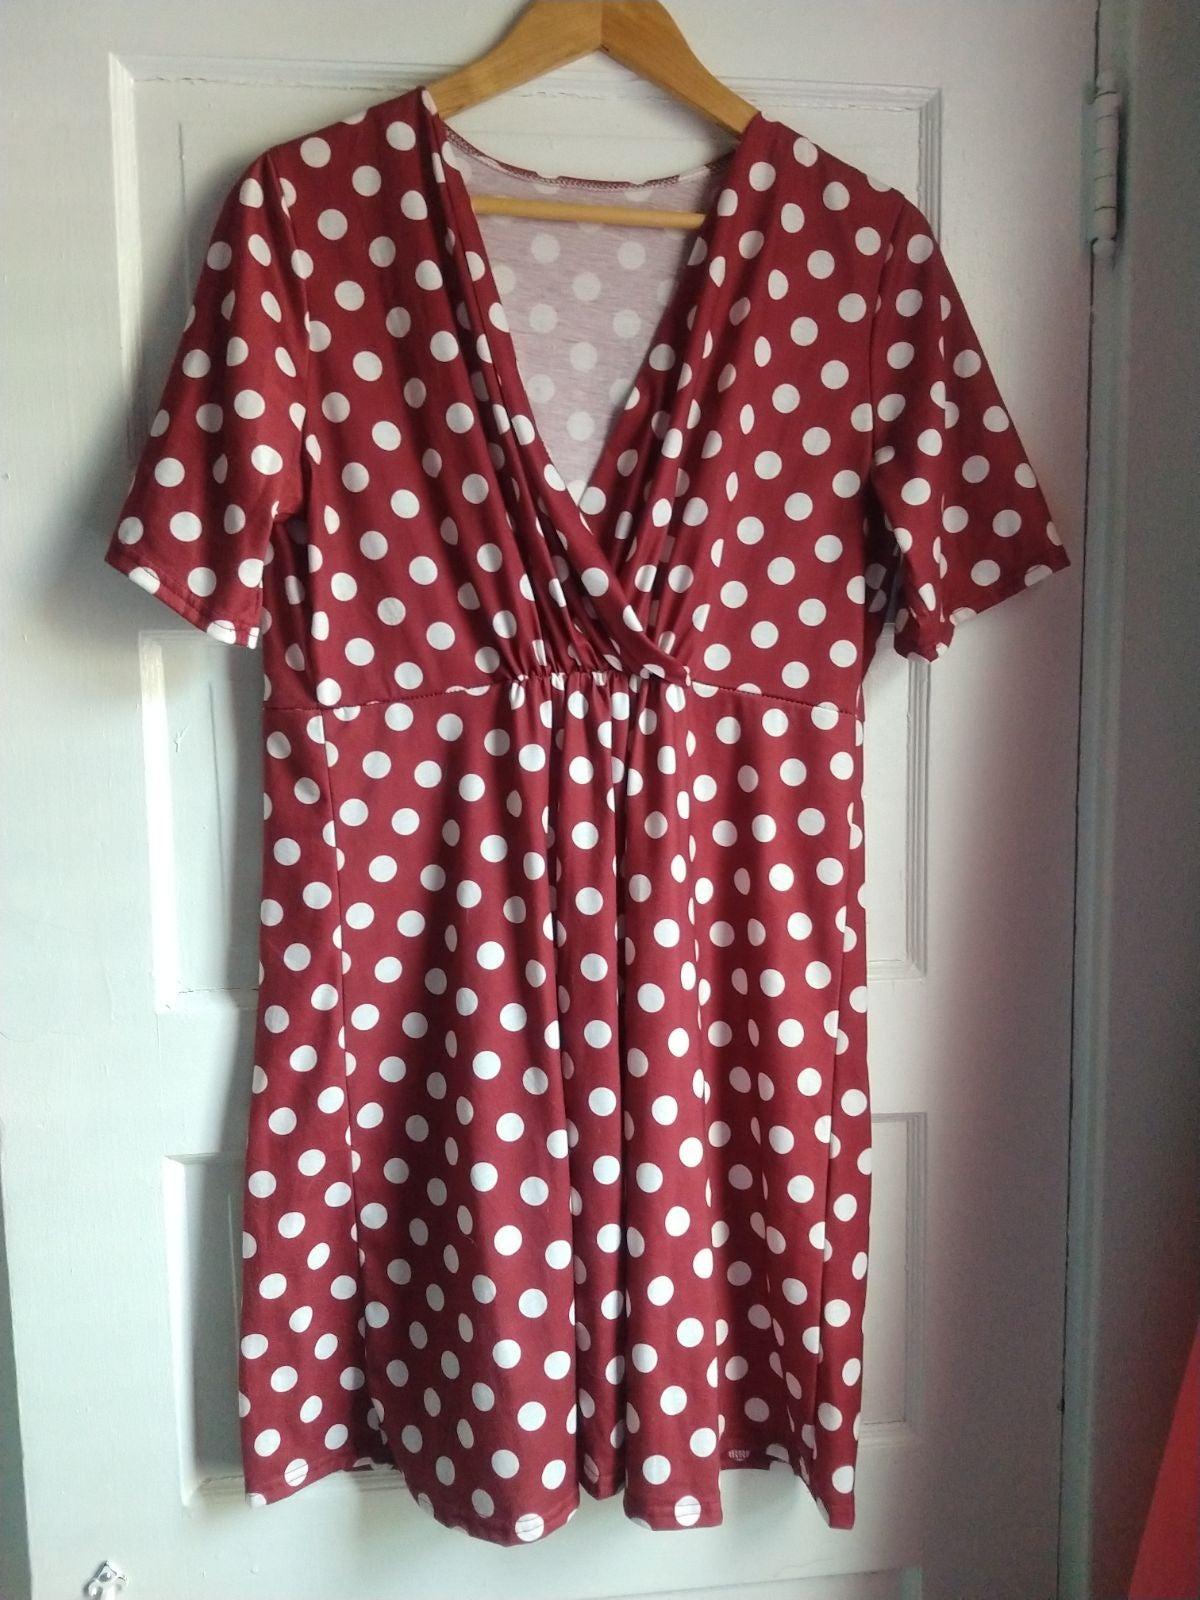 Maternity/Nursing Polka Dot Dress